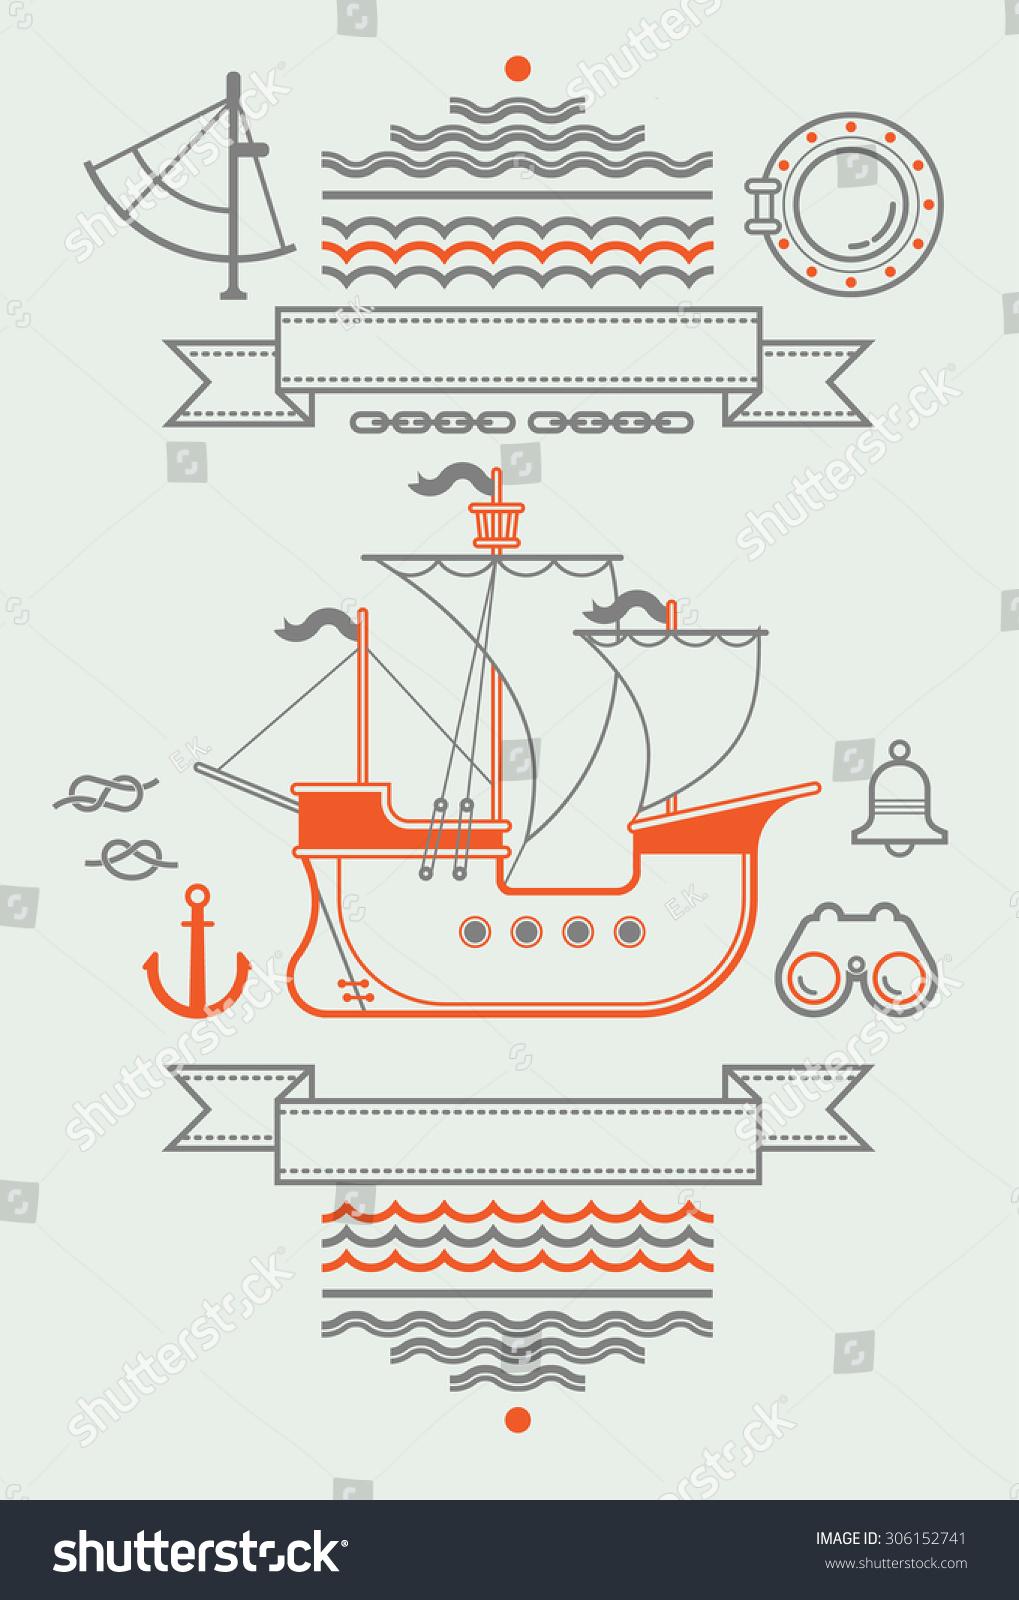 Composition sailing symbols historic caravel ship stock vector composition with sailing symbols and historic caravel ship buycottarizona